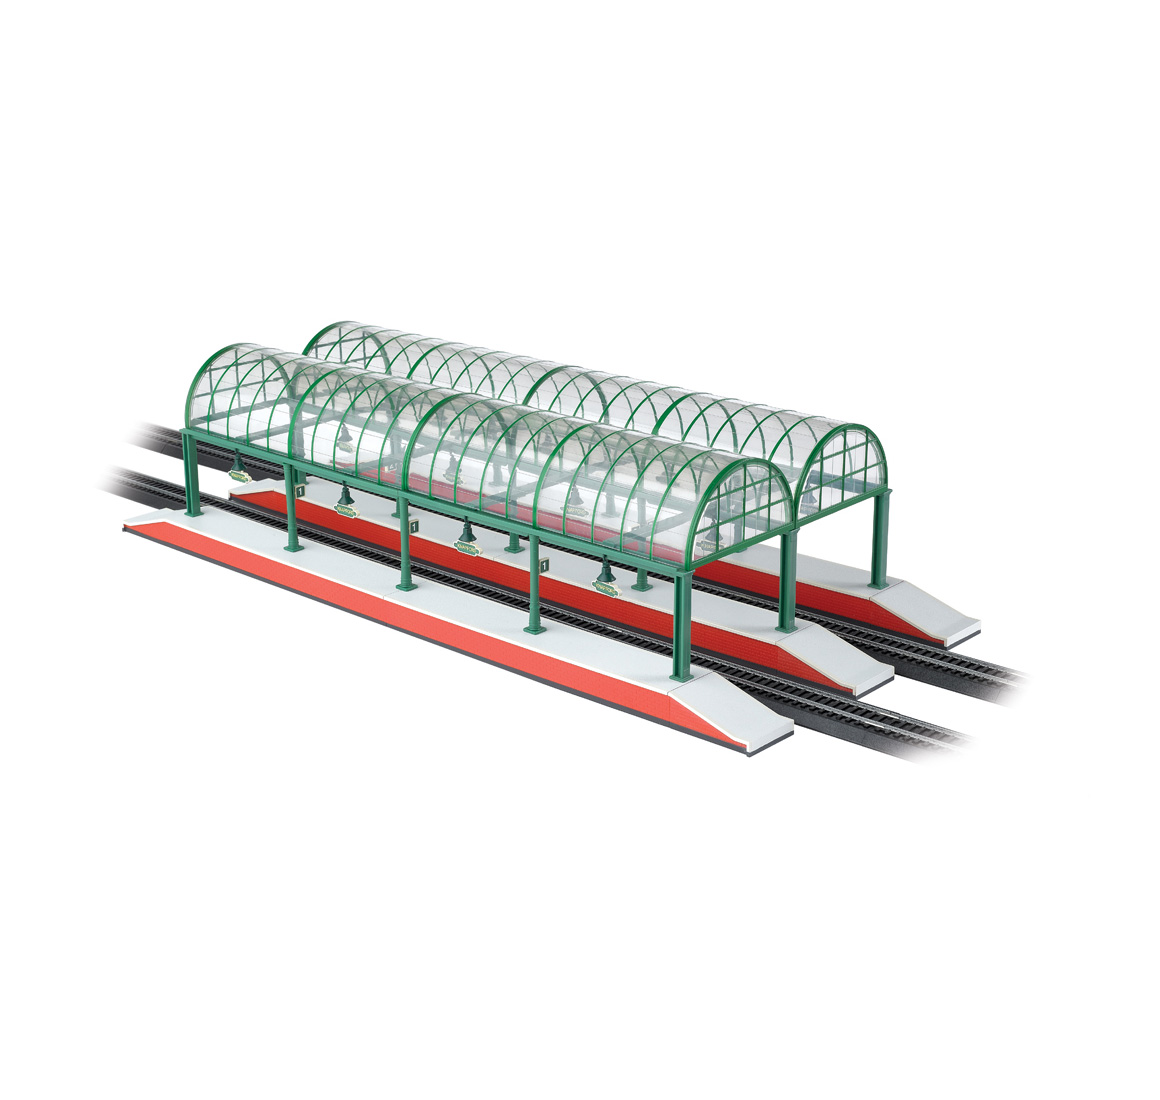 bachmann_thomas_friends_knapford_station_building_kit